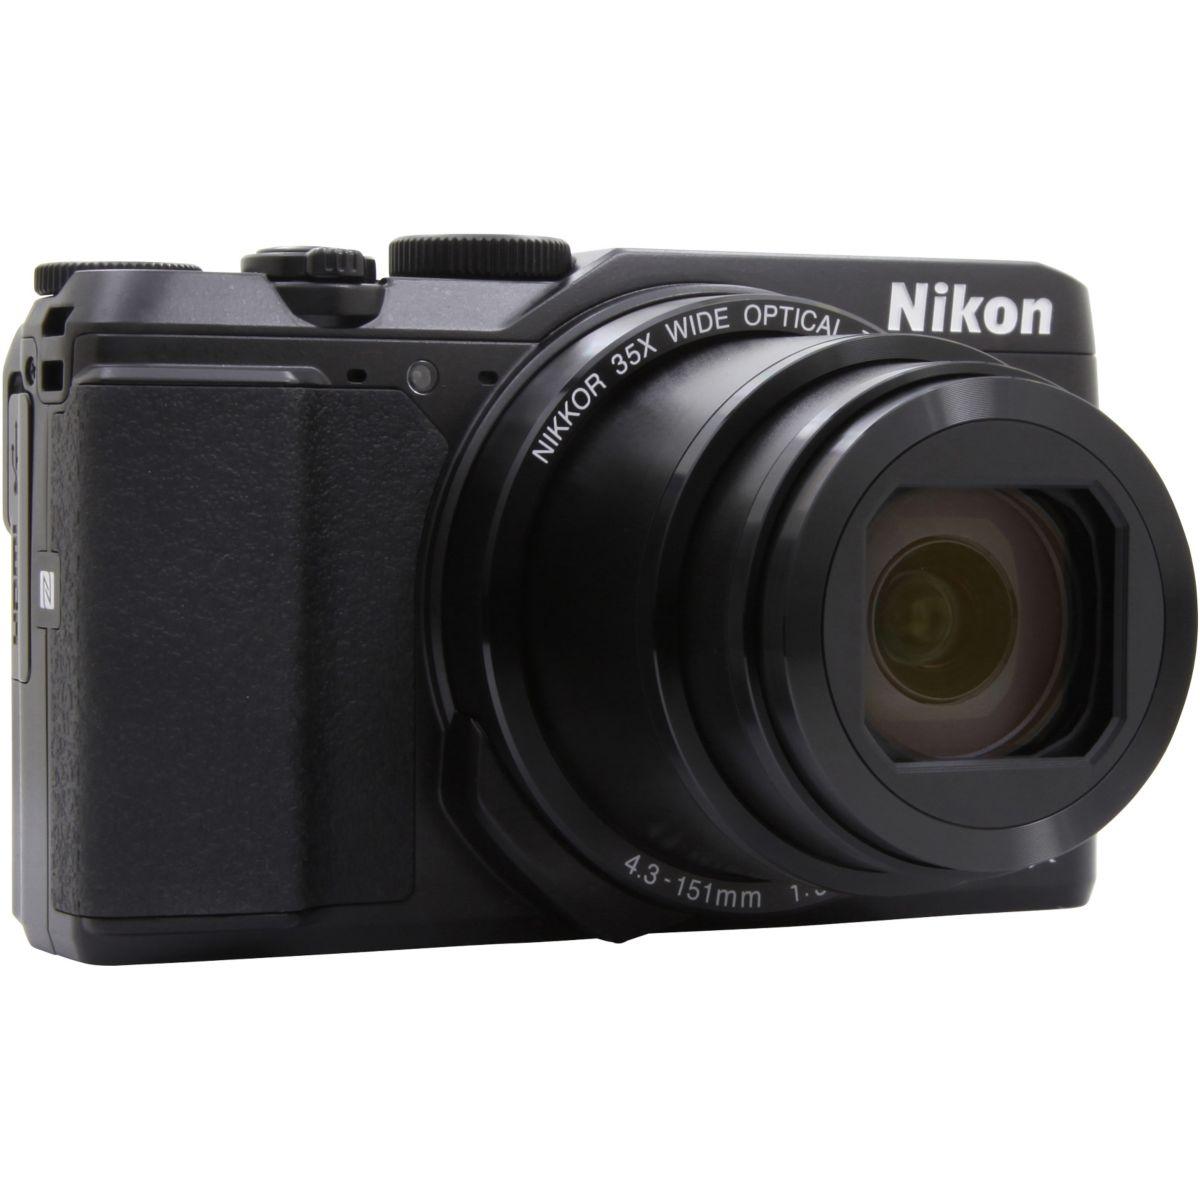 Appareil photo Compact NIKON Coolpix A900 Noir